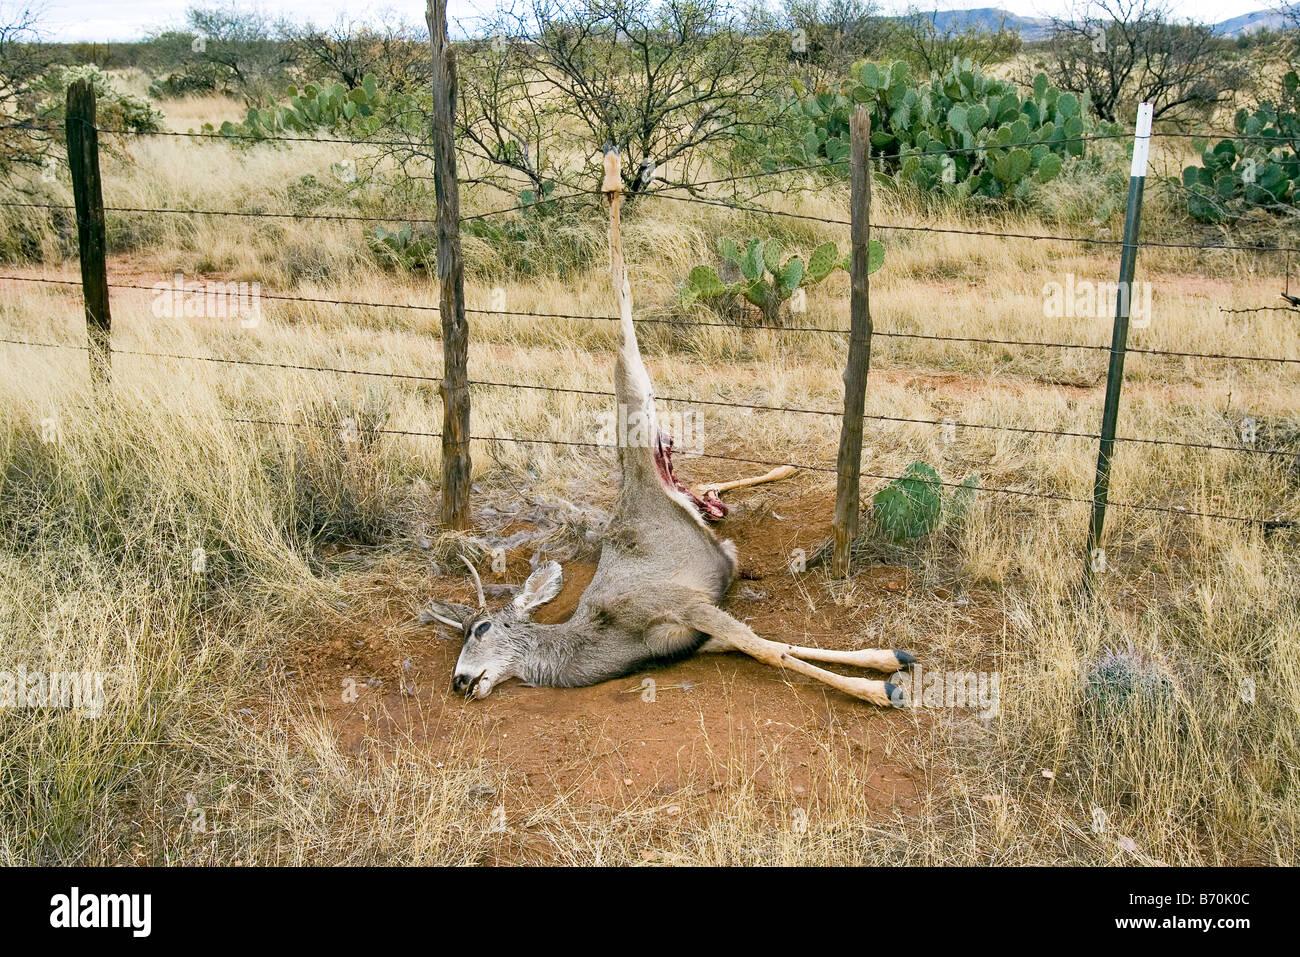 Mule Deer Odocoileus hemionus Catalina Arizona United States 16 December First year Male Cervidae - Stock Image